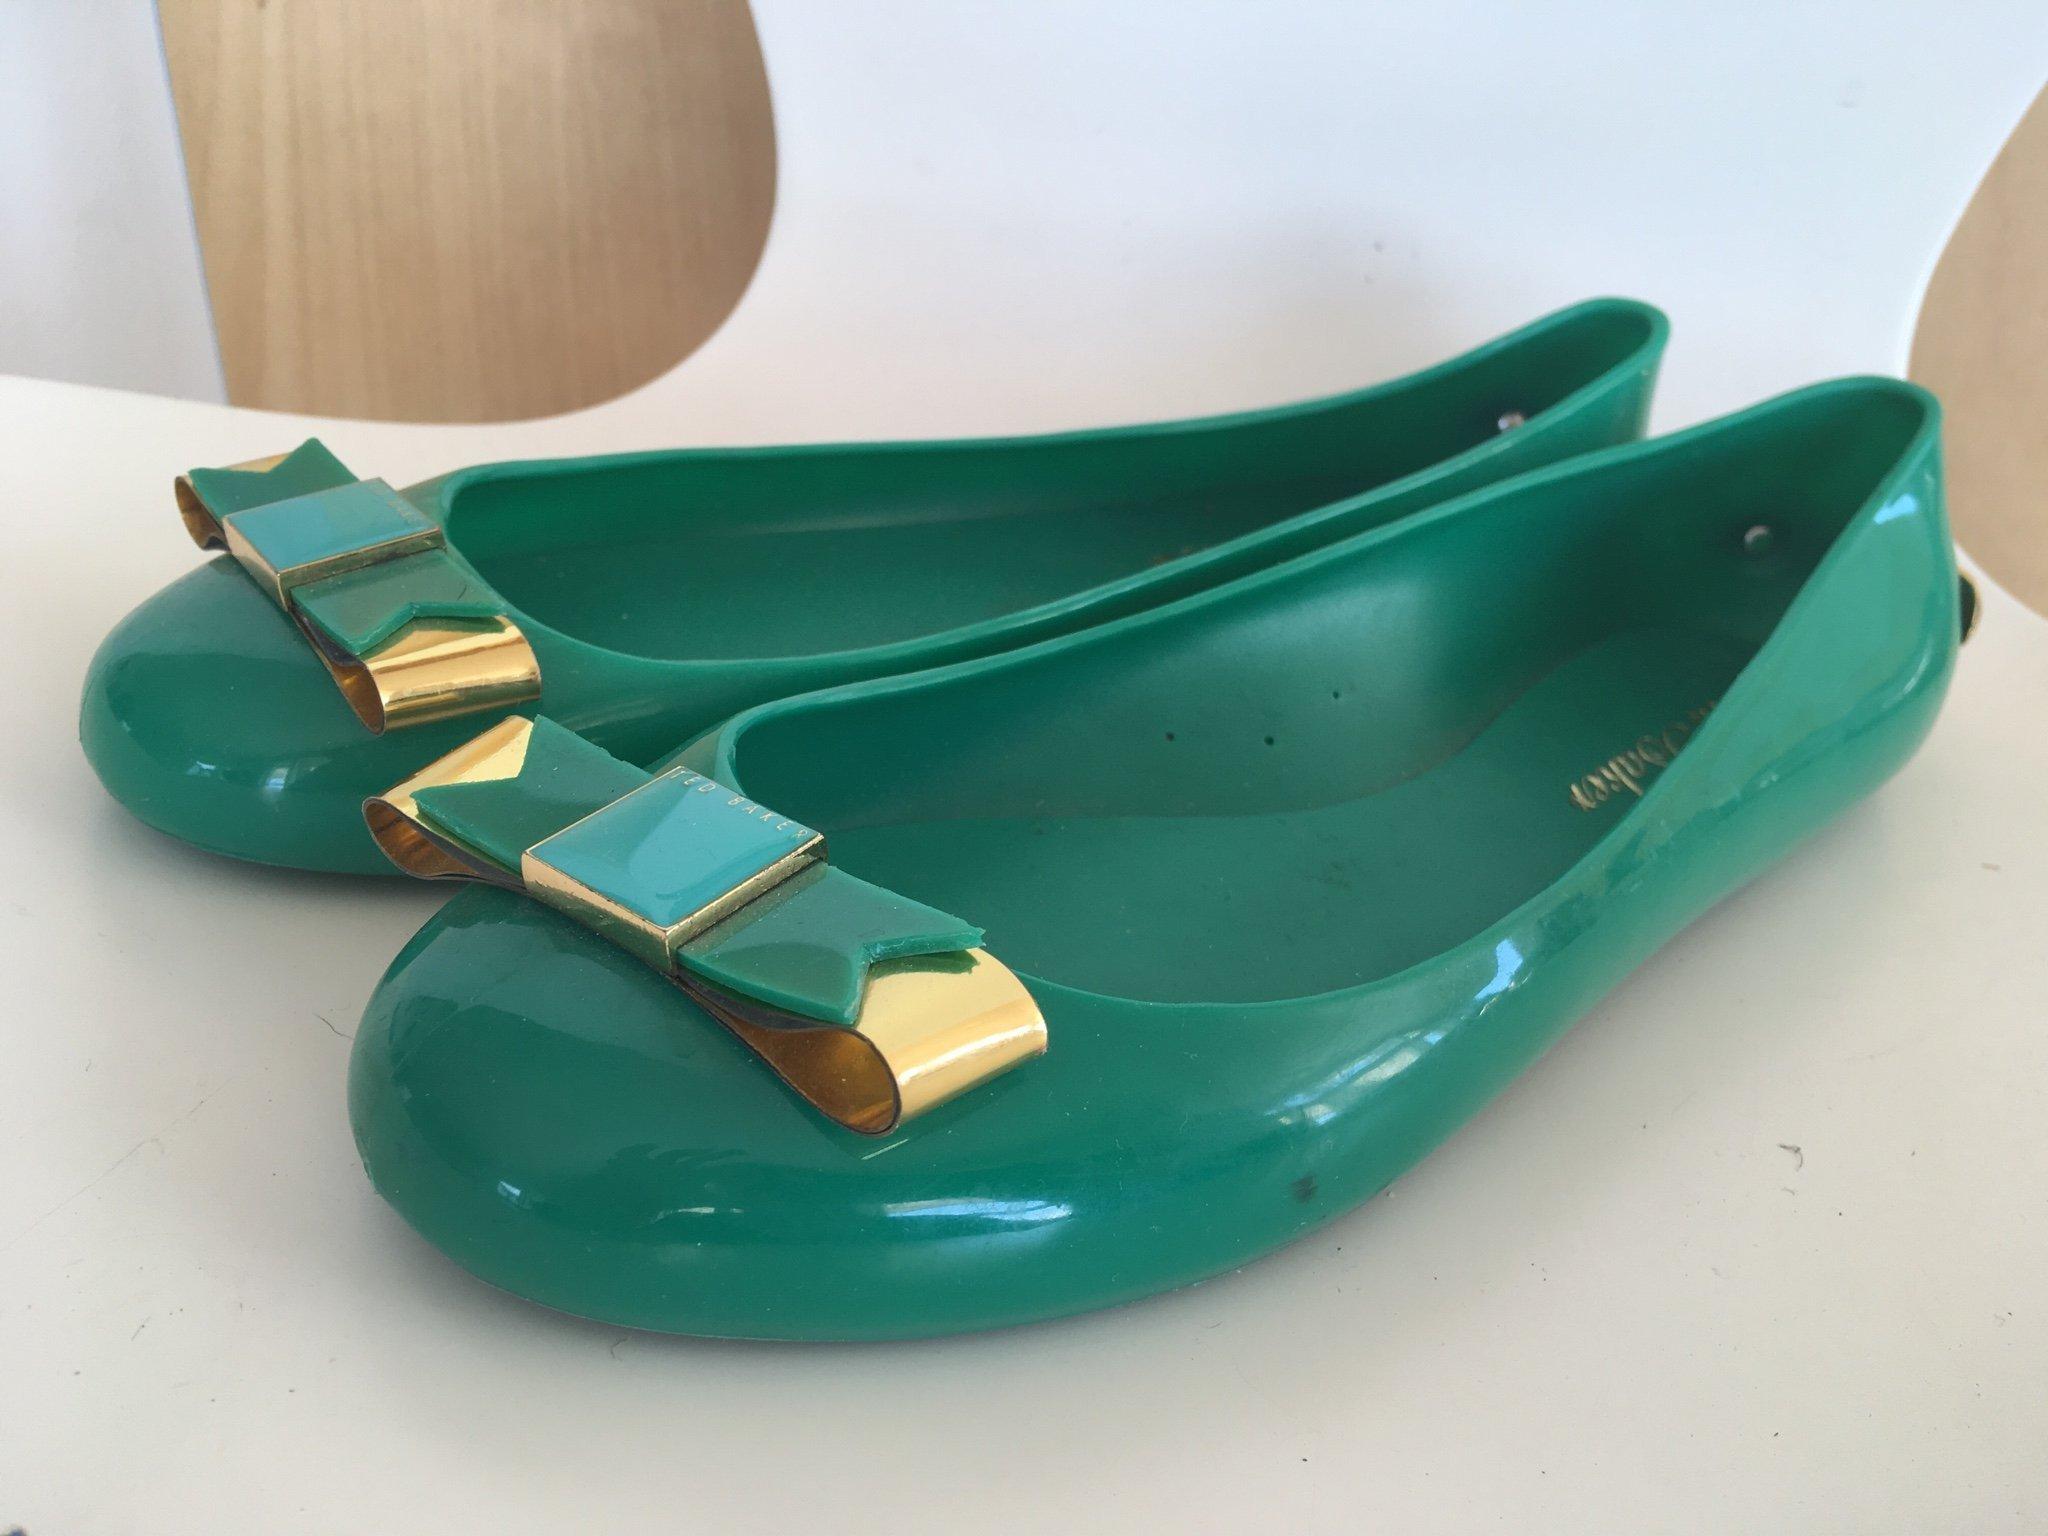 reputable site 676cc 9a2dd Nyskick! TED BAKER ballerina gummi gröna (358182549) ᐈ Köp ...